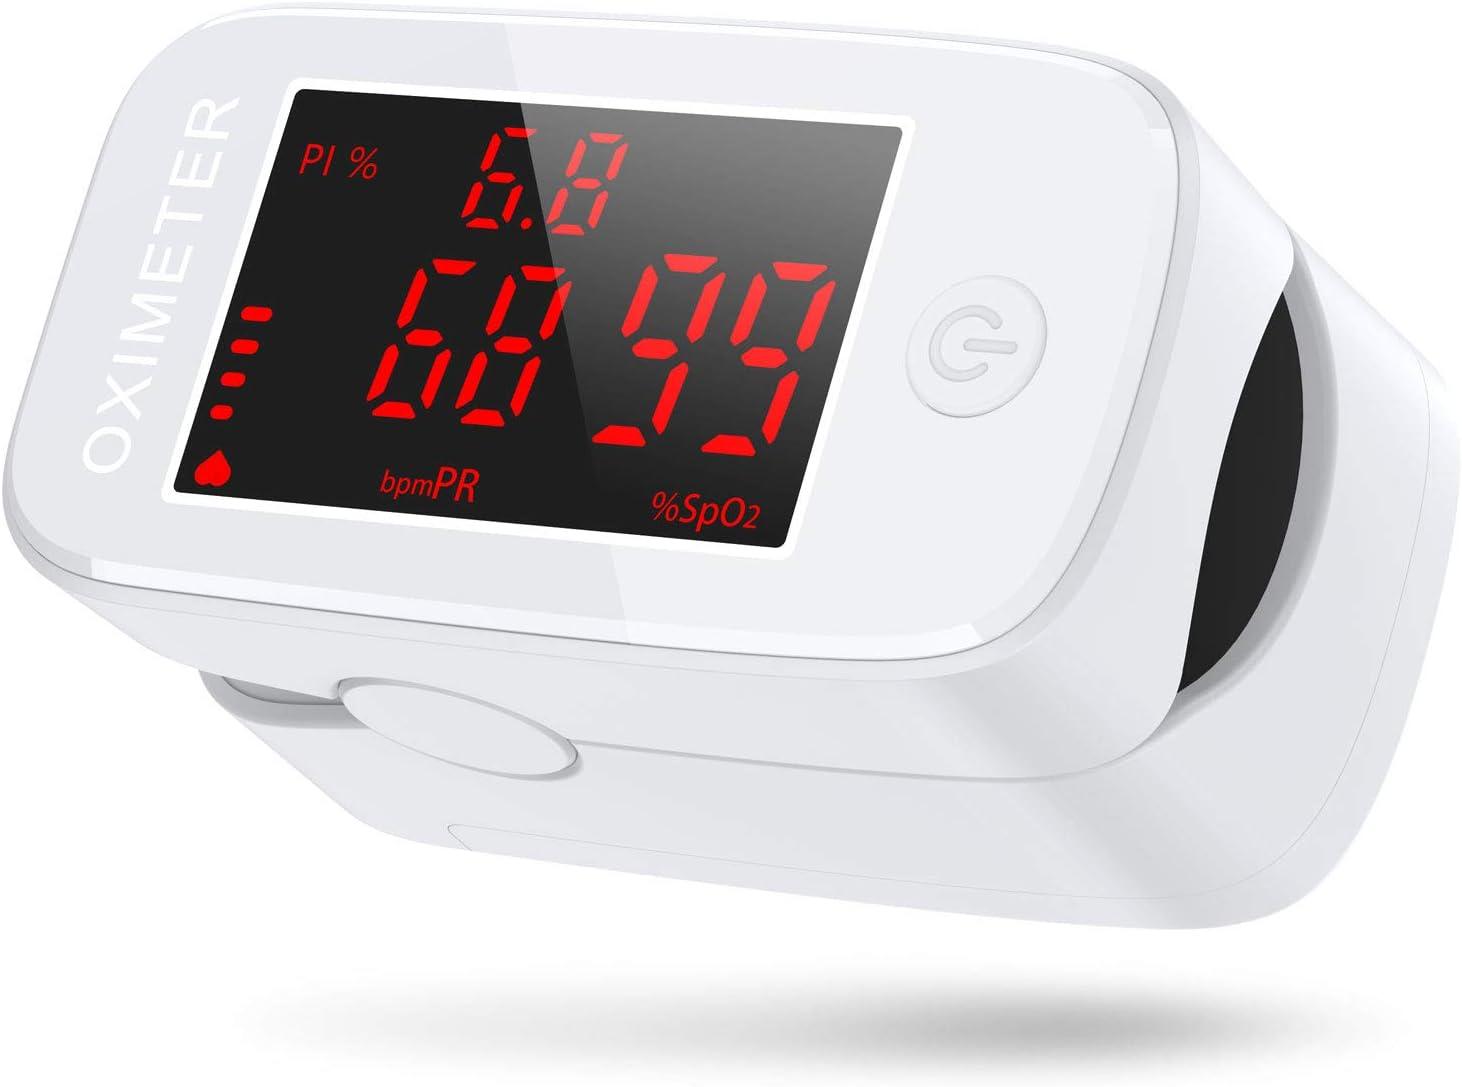 Oximetro Dedo, JOYSKY Pulsioximetro de Dedo Profesional 3 en 1, Oxímetro de Pulso Digital de Lectura Instantánea, Medidor de Oxigeno en Sangre con Pantalla LED